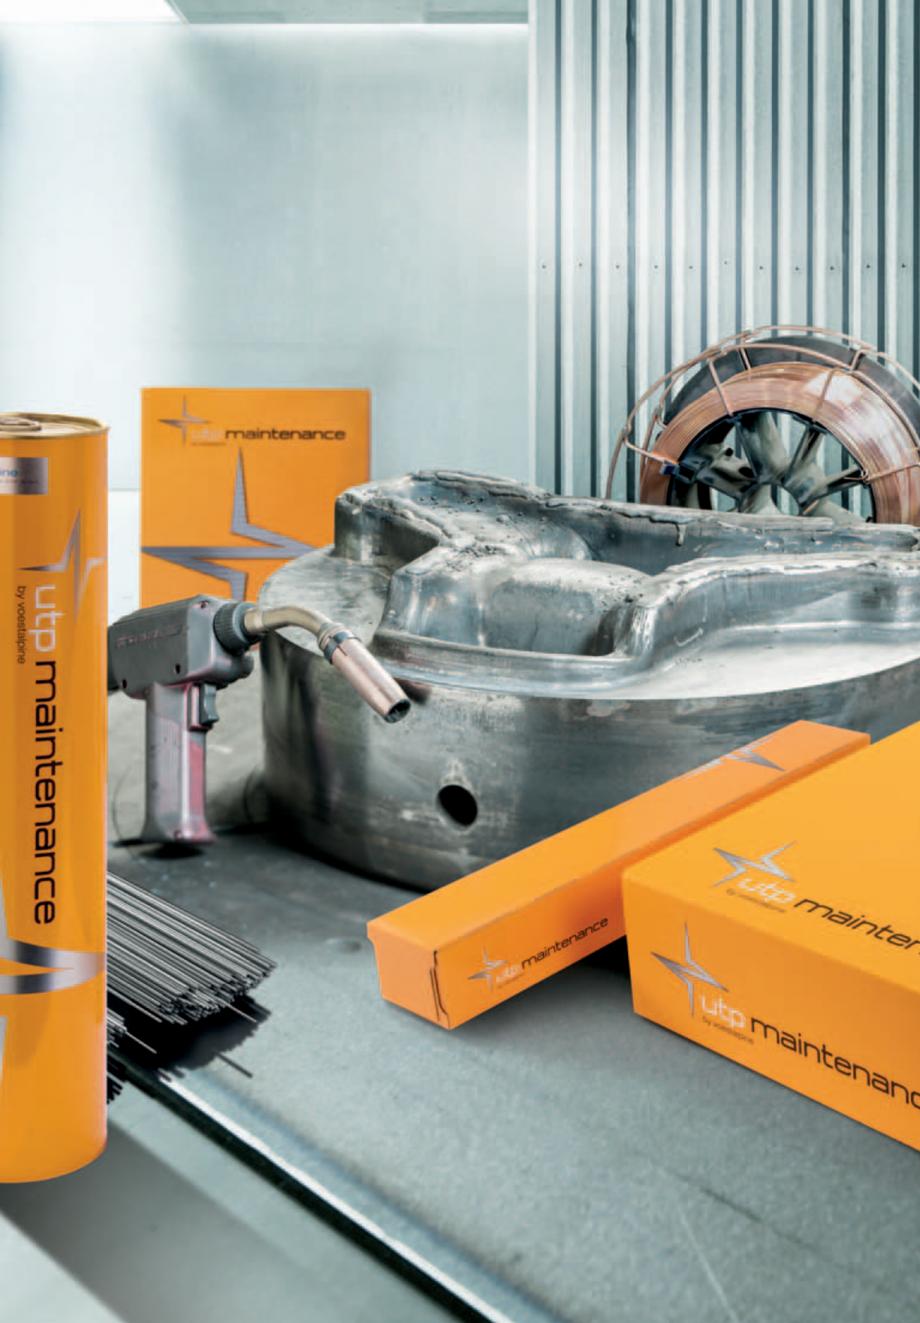 Pagina 4 - Solutii complete (materiale de adaos) pentru mentenanta si reparatii TEHNIC GAZ WELDING...